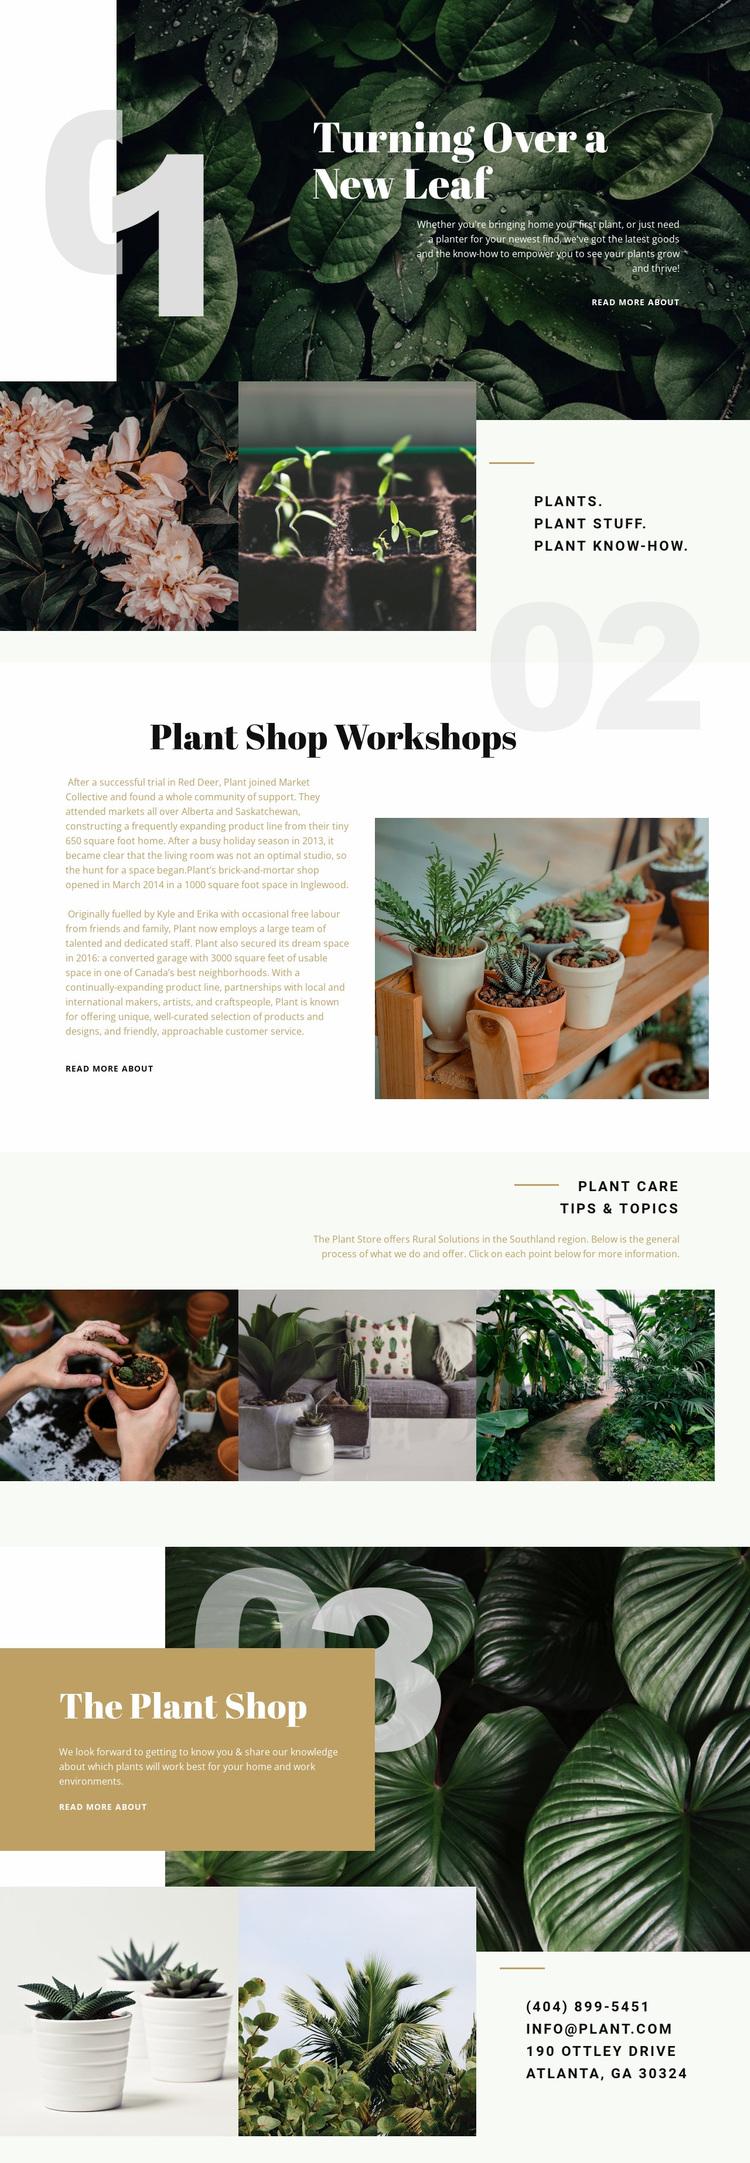 Plant Shop Website Design